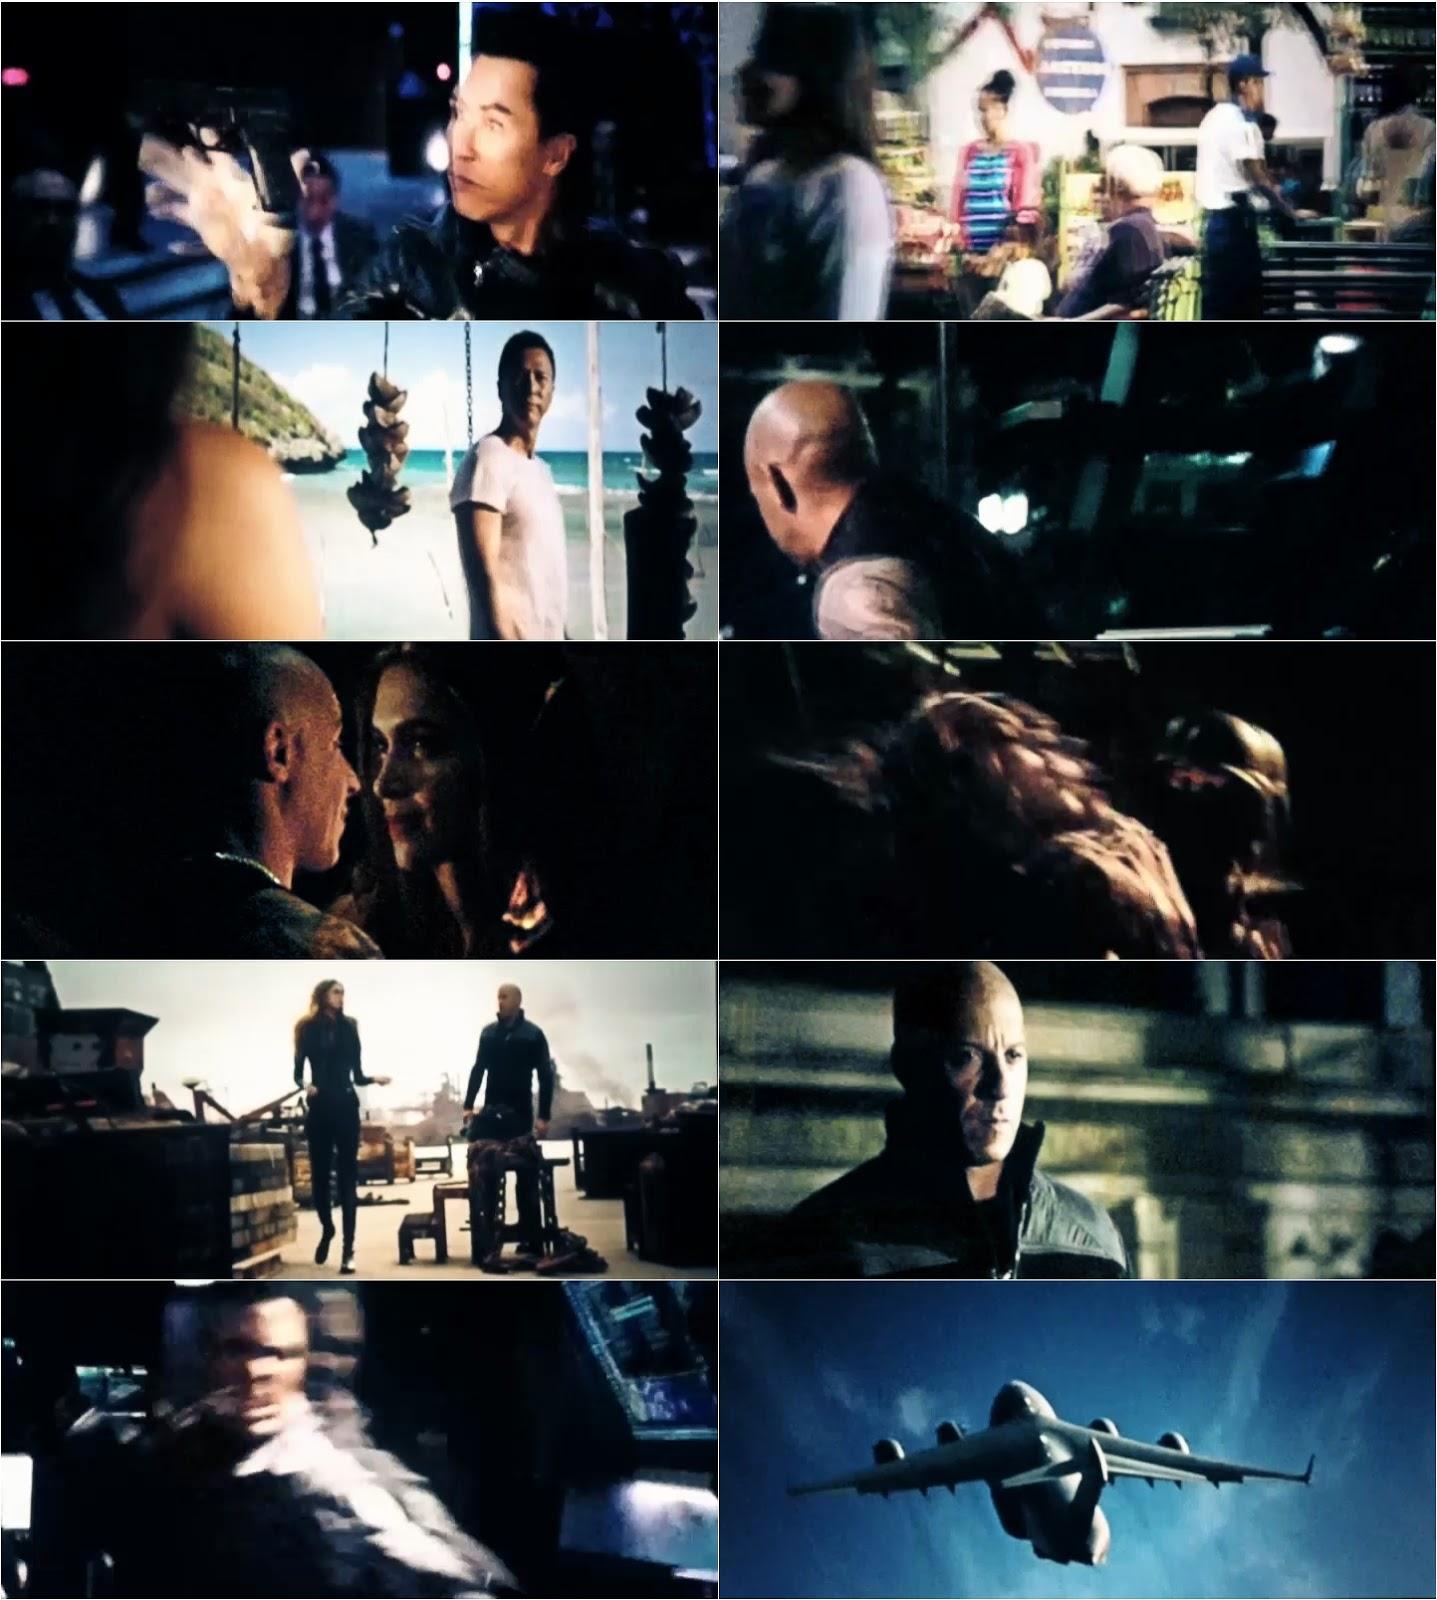 xXx: Return of Xander Cage Screenshot